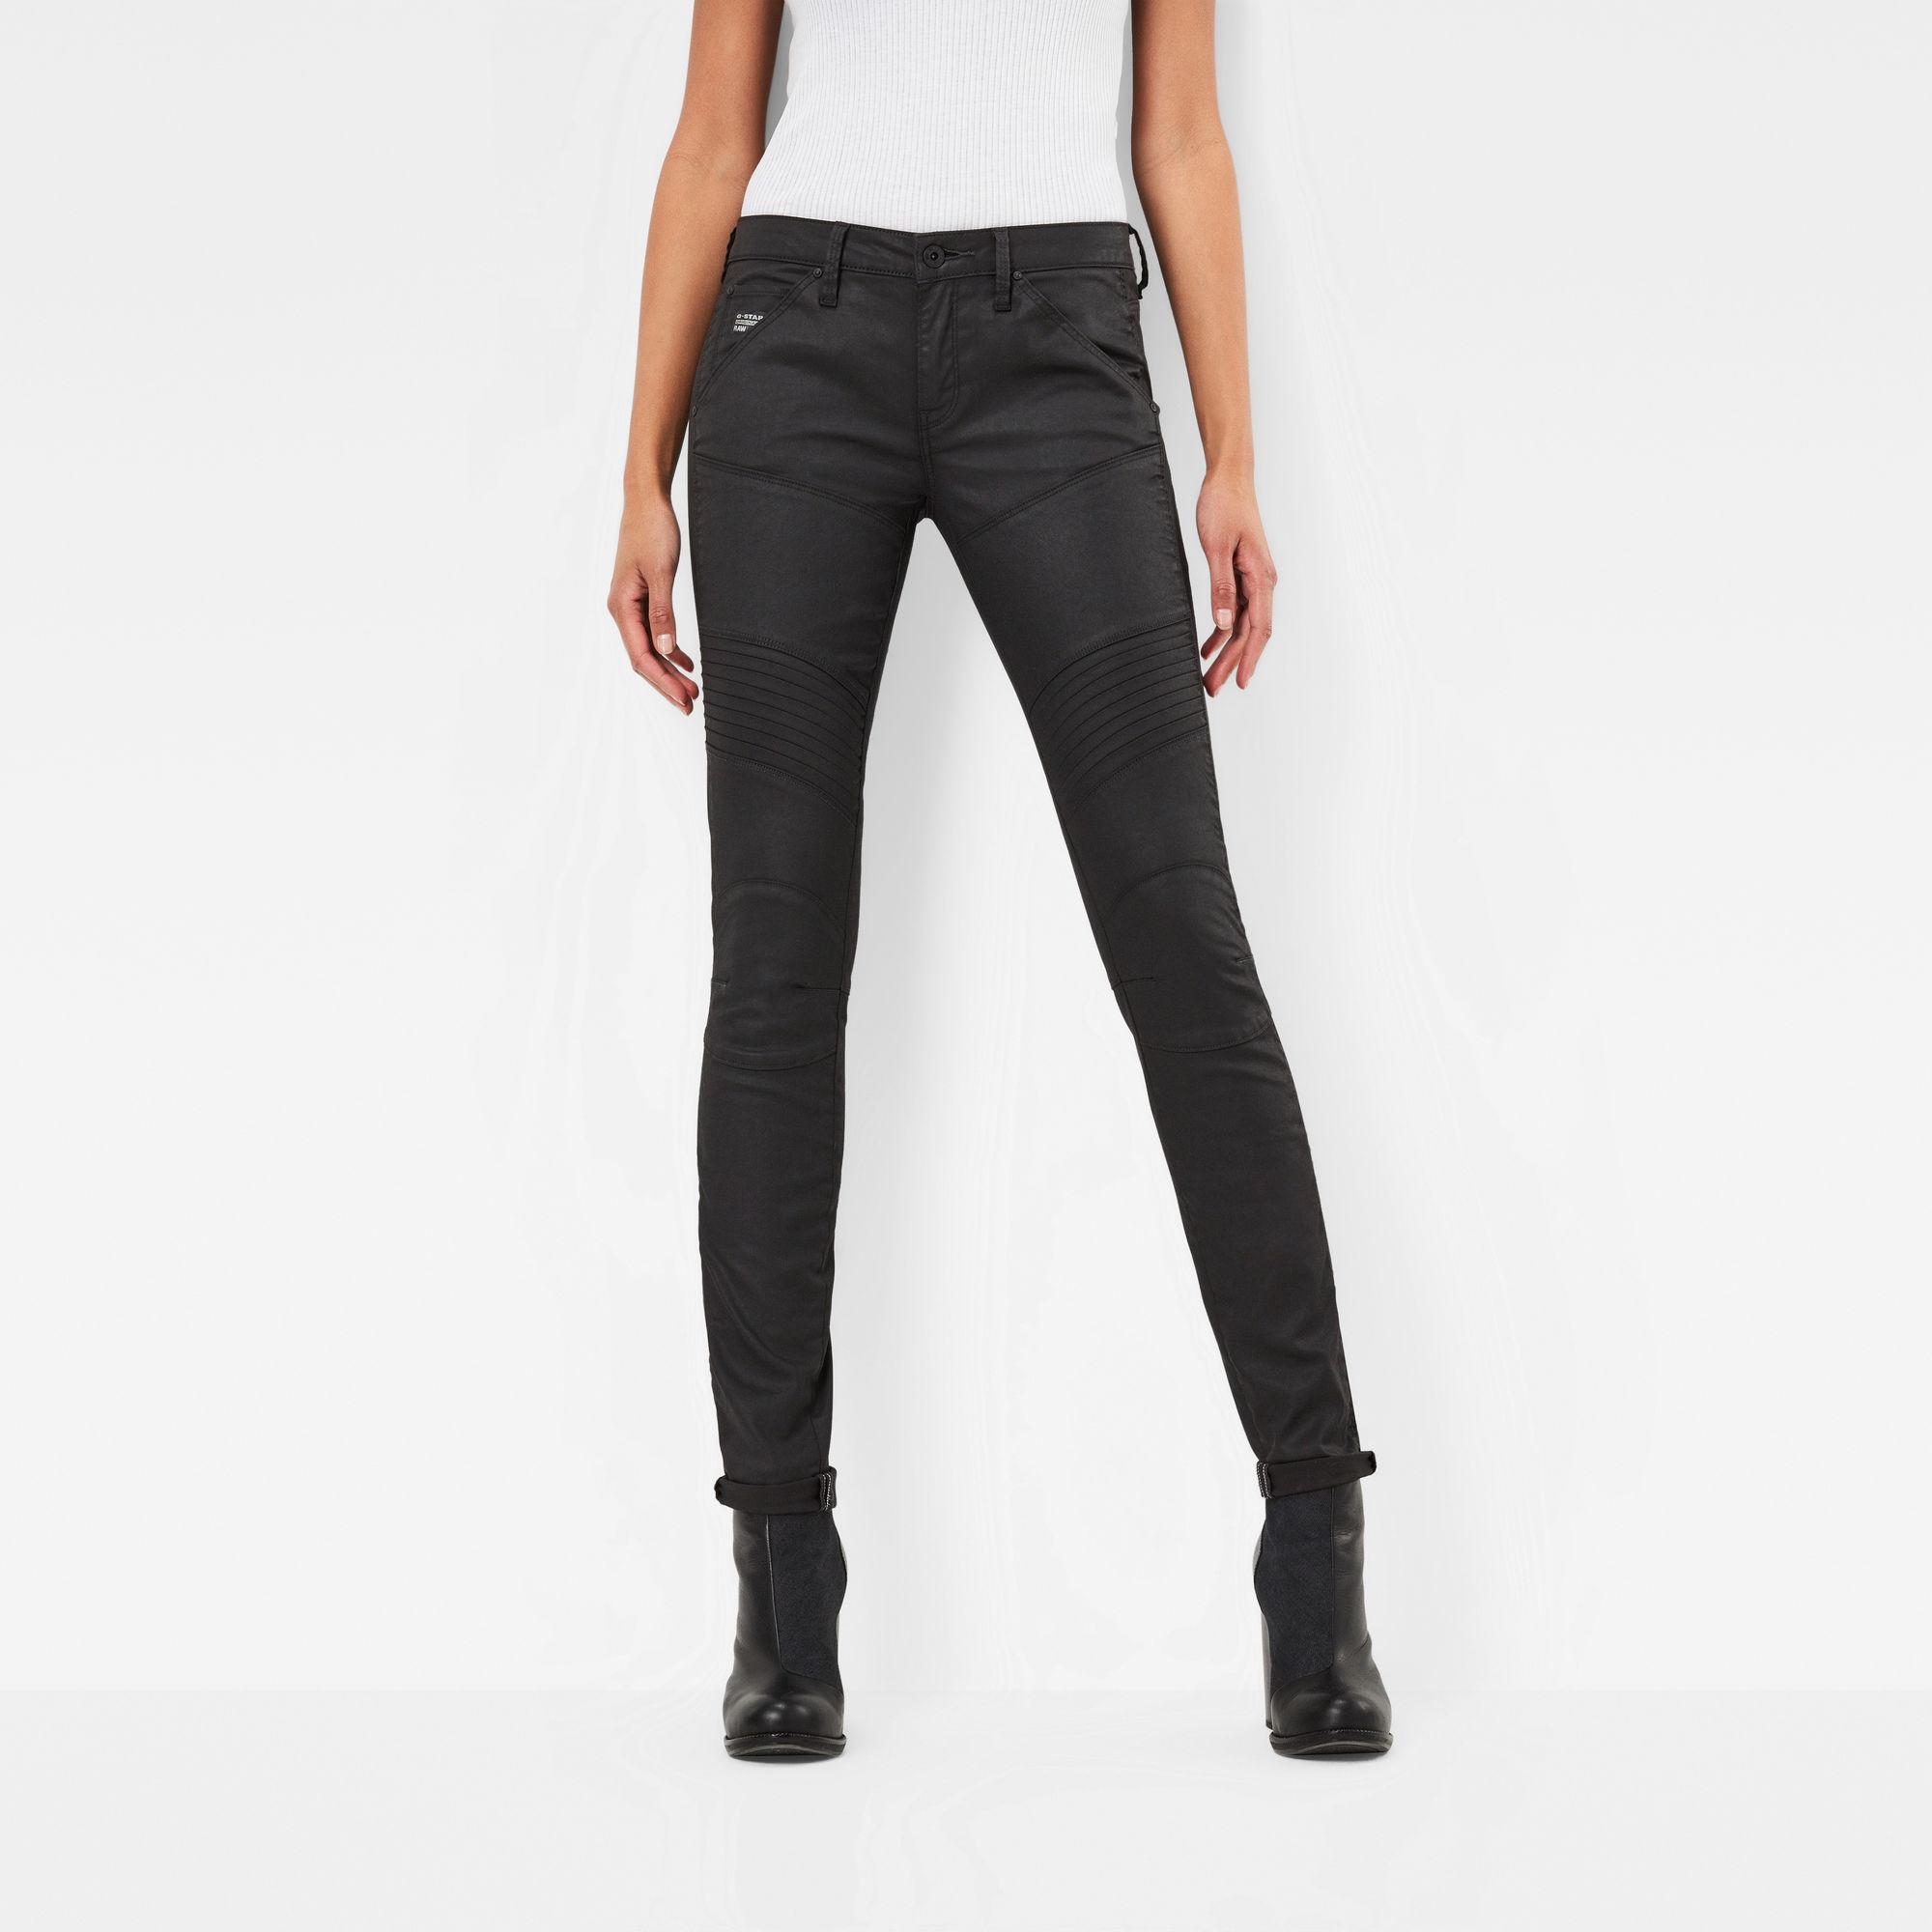 Image of G Star Raw 5620 Custom Mid Skinny Jeans